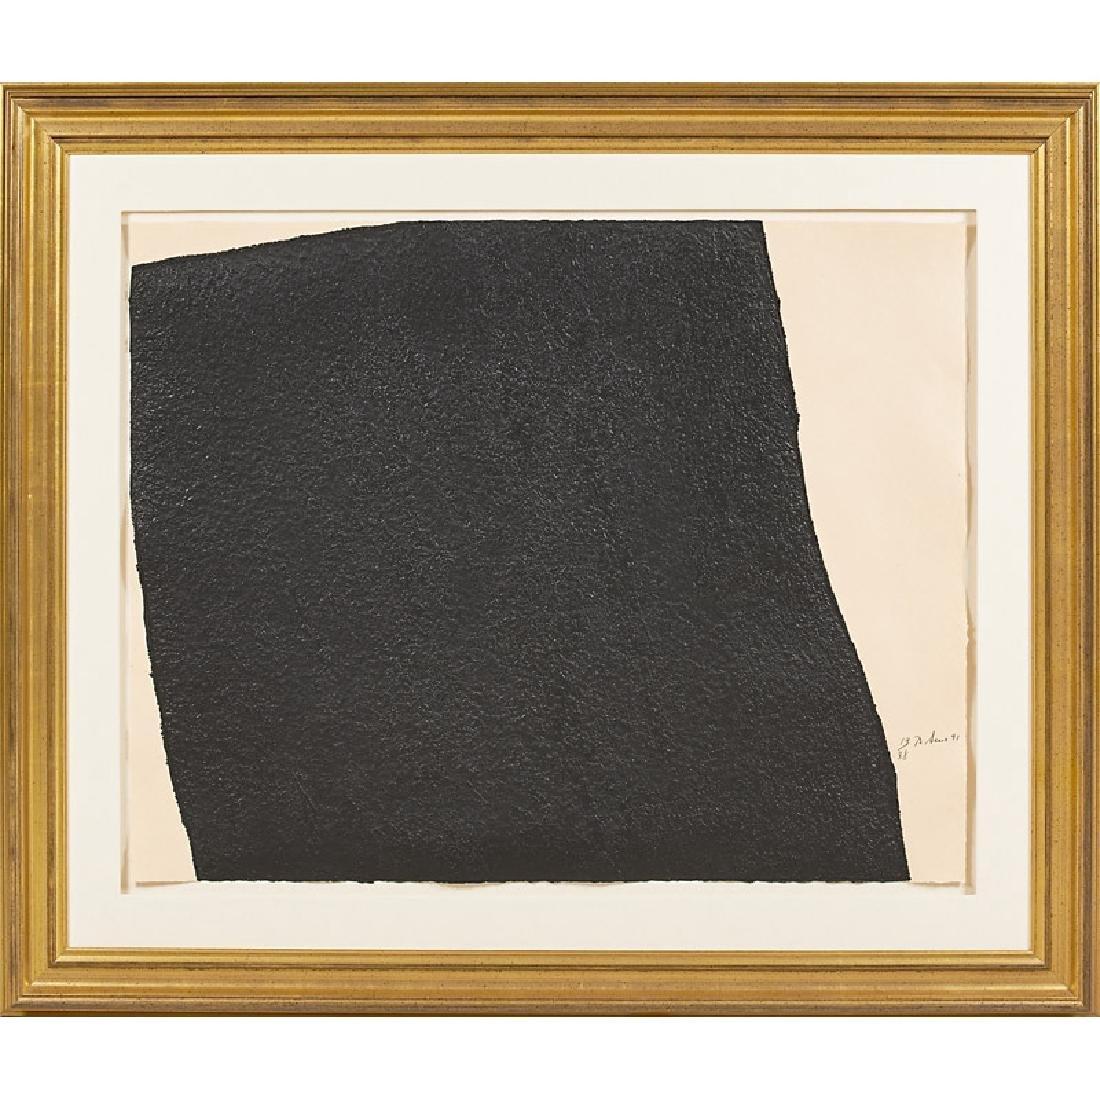 Richard Serra (American, b. 1938)